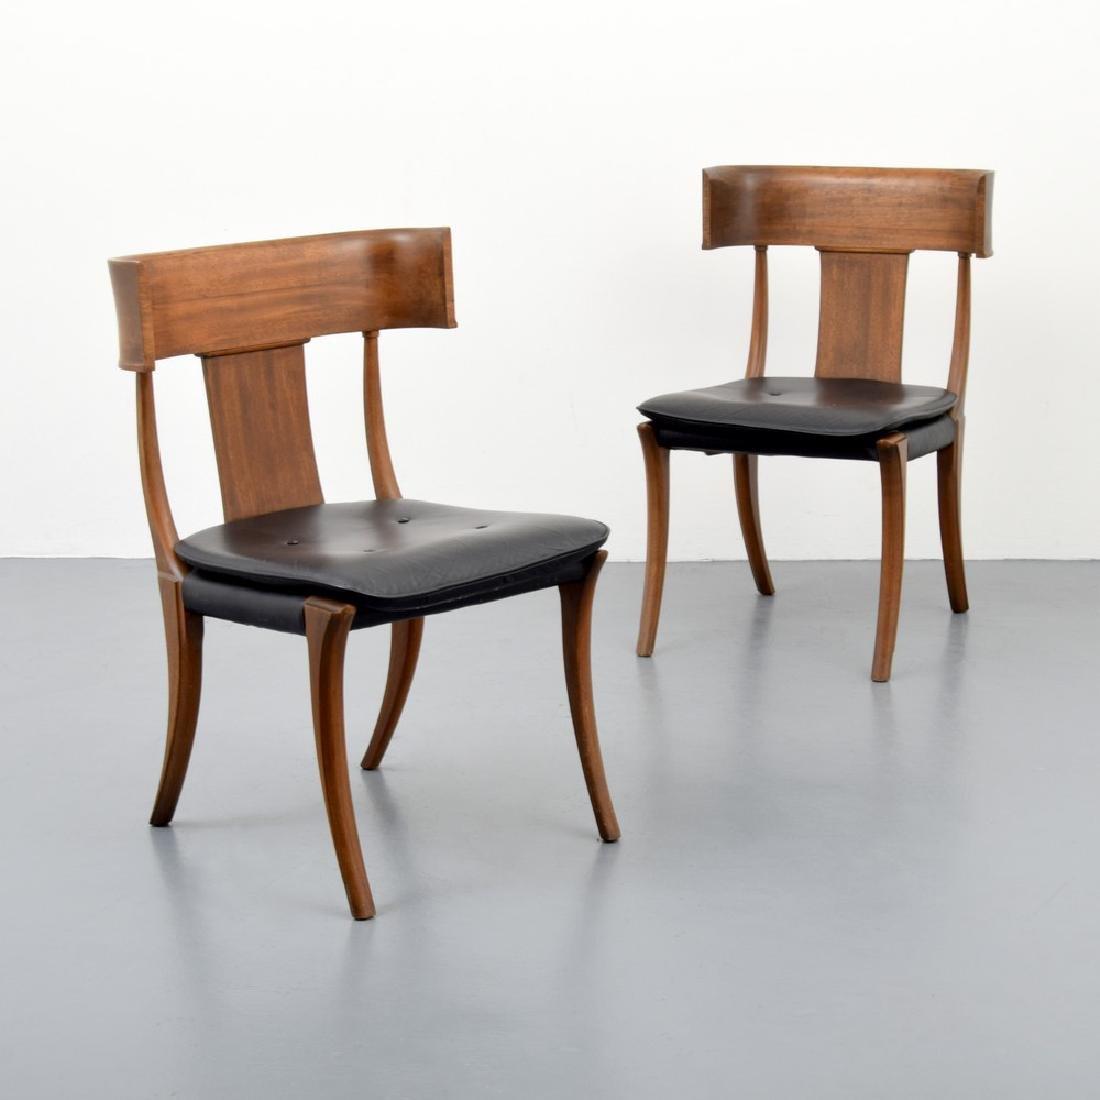 "Stewart & MacDougall ""Klismos"" Dining Chairs, Set of 8 - 9"